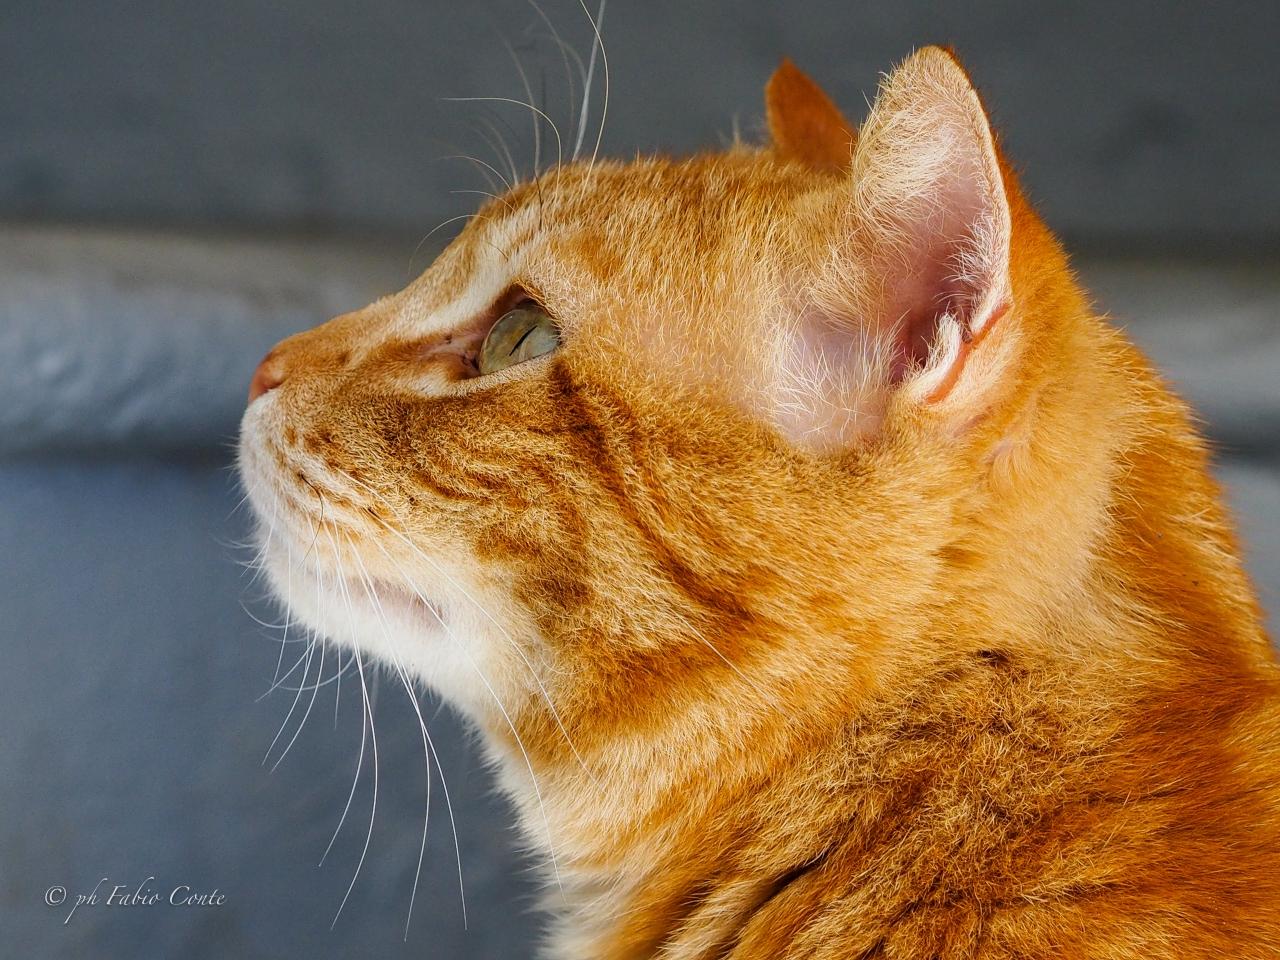 Fruby, the cat ......